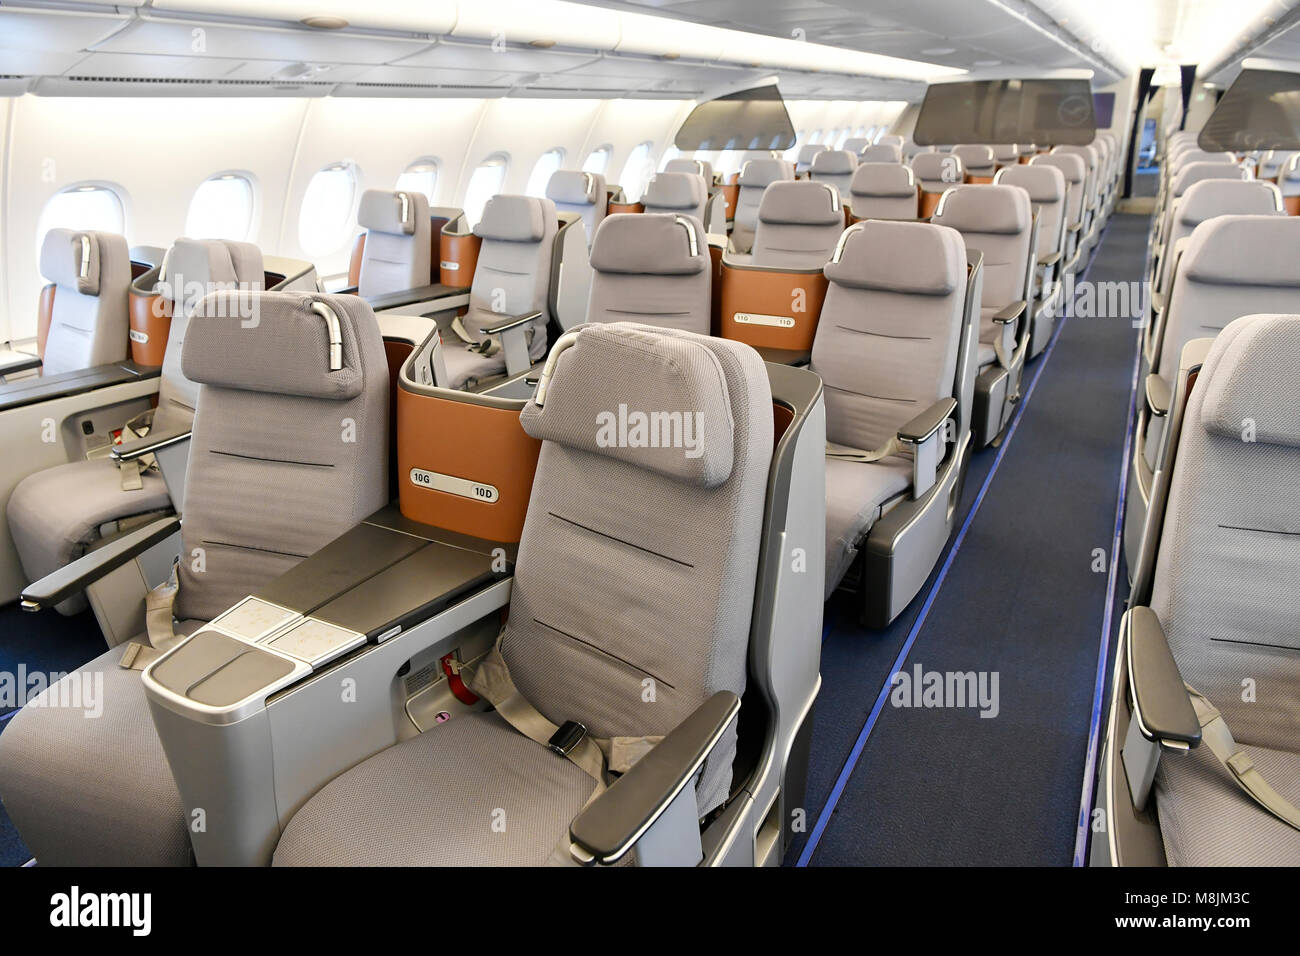 displays seats lufthansa airbus a380 800 emergency exit sleep stock photo 177431840 alamy. Black Bedroom Furniture Sets. Home Design Ideas